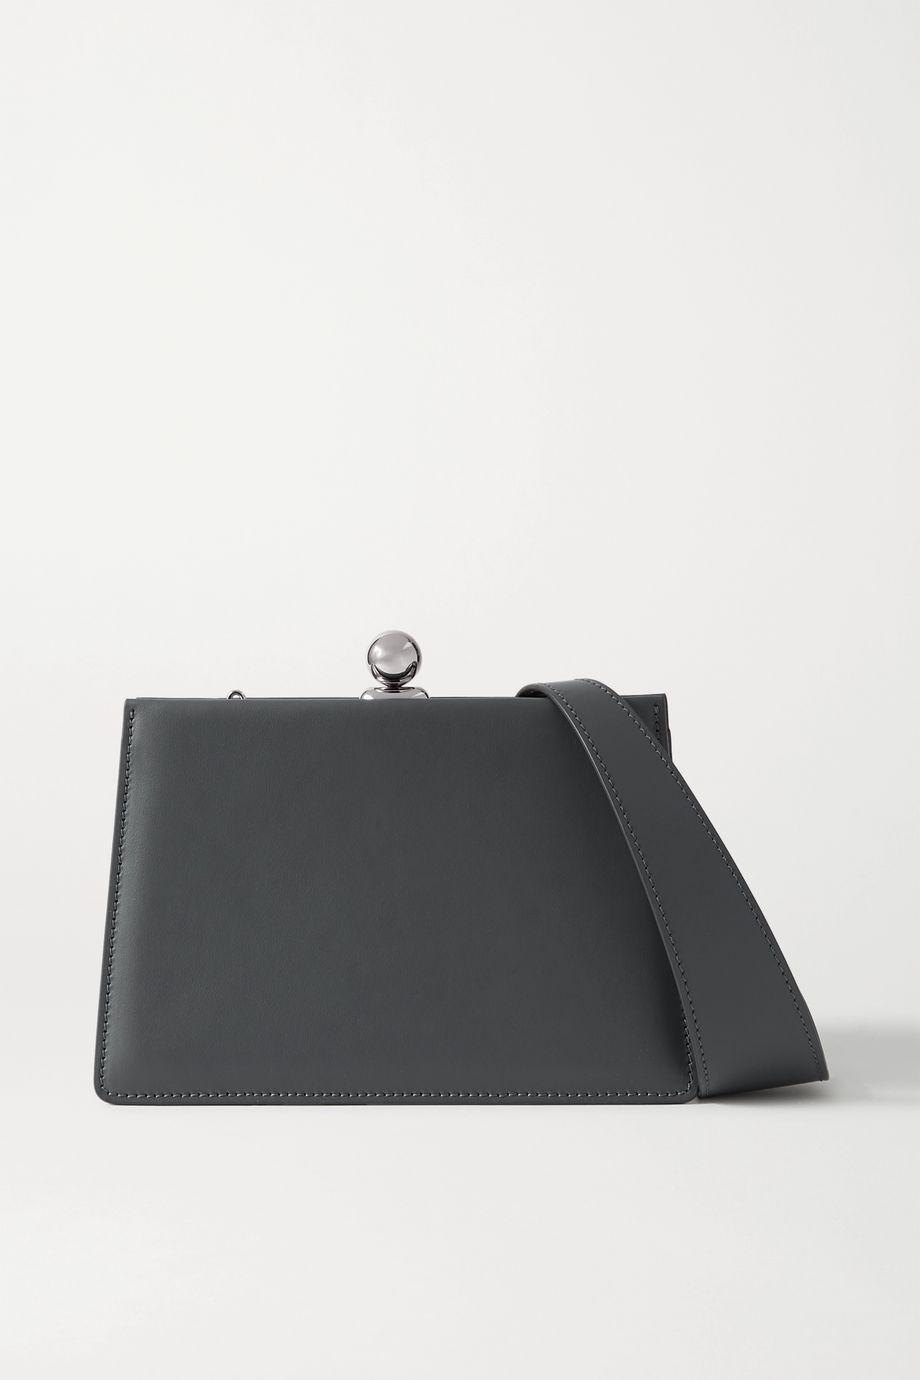 Ratio et Motus Mini Twin Schultertasche aus Leder